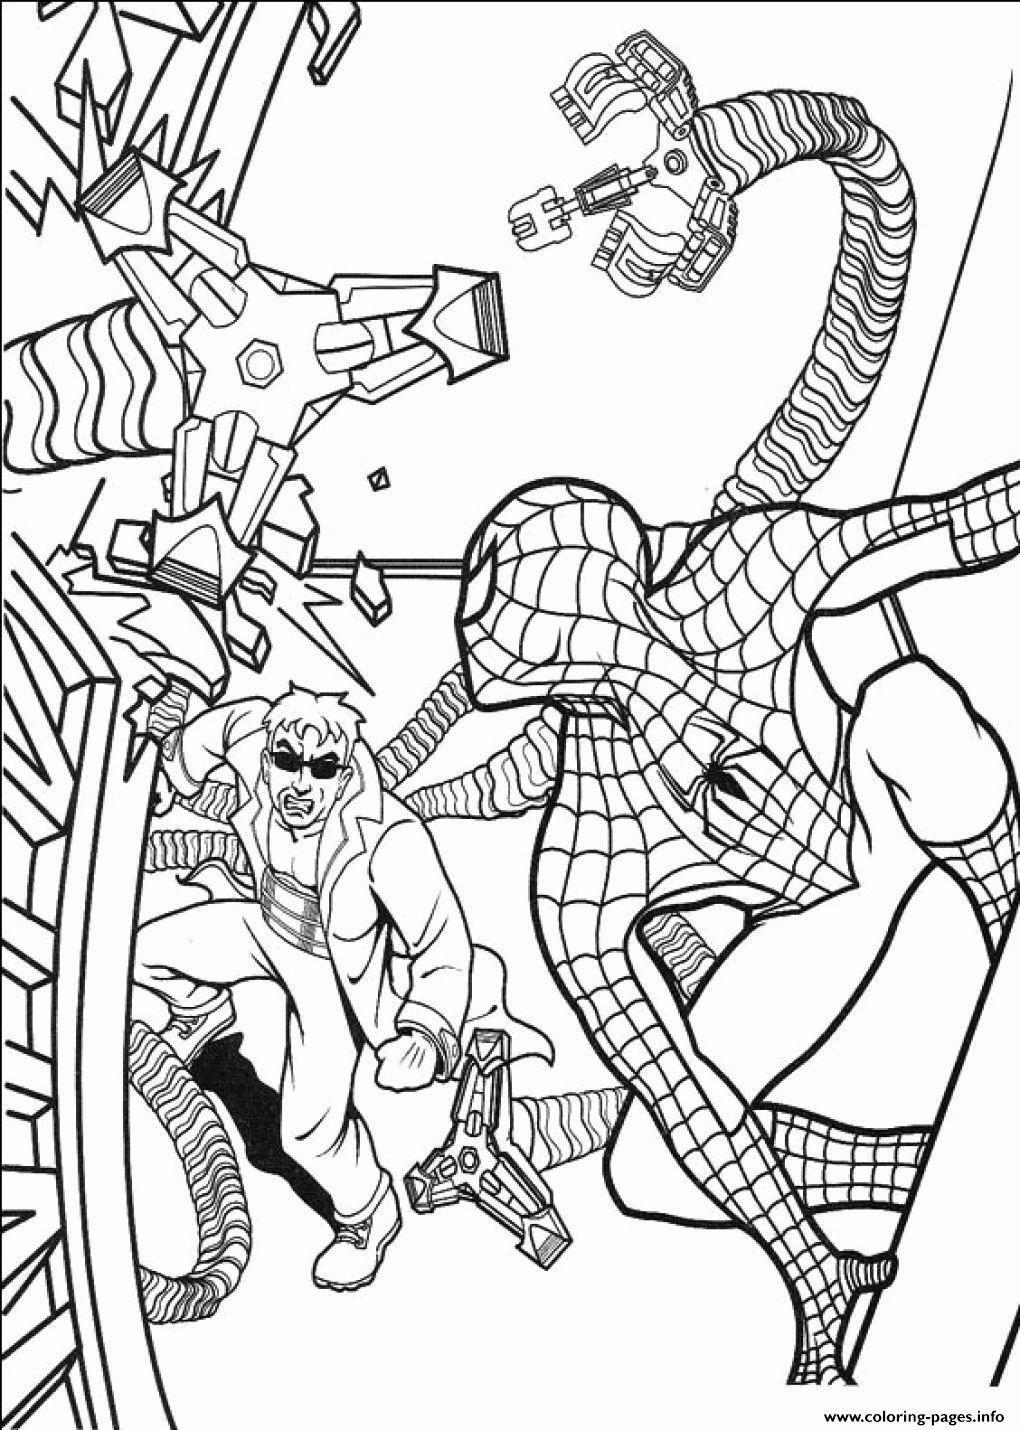 Cartoon Coloring Pages Pdf Elegant Spiderman Coloring Pages Printable Pdf Spiderman Coloring Cartoon Coloring Pages Coloring Pages